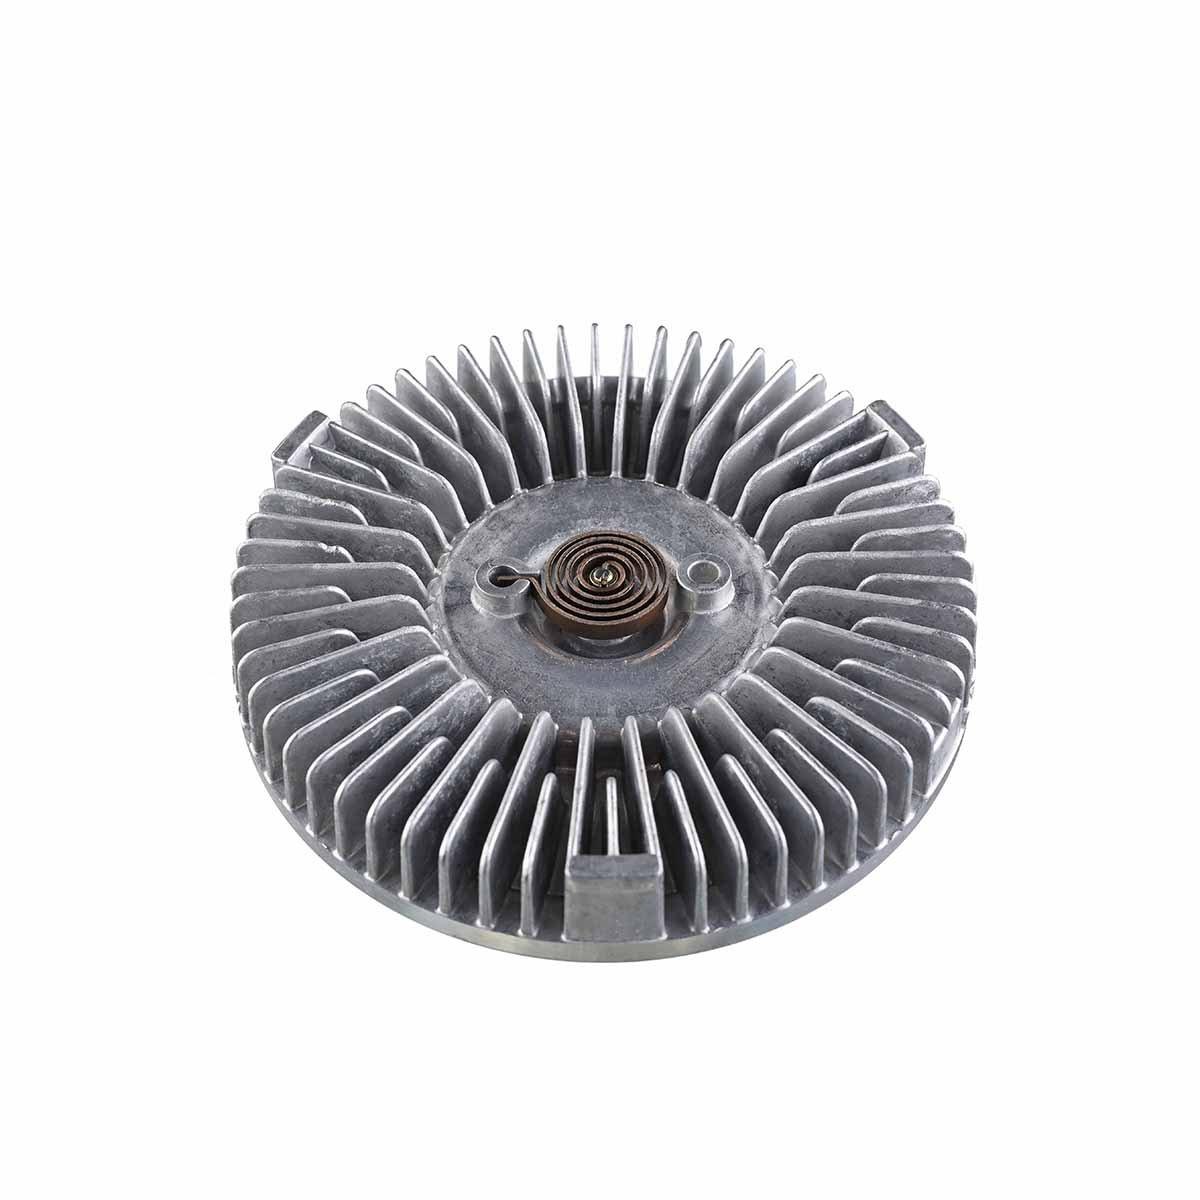 A-Premium Engine Cooling Fan Clutch for Chevrolet Colorado GMC Canyon 2004-2012 Isuzu I-290 2007-2008 I-280 2006